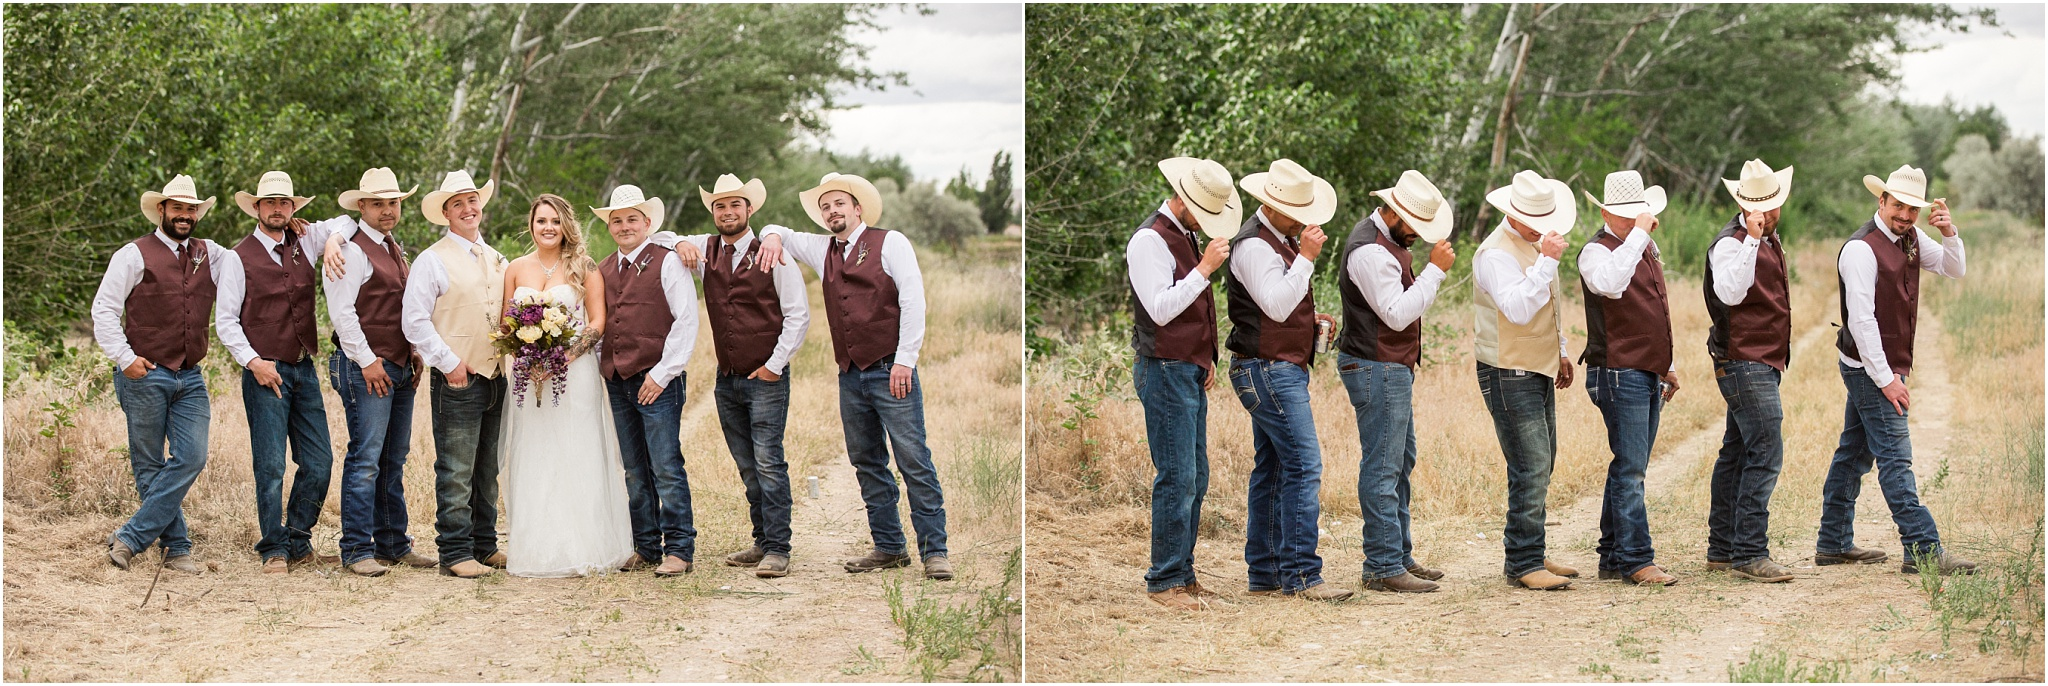 Wedding Photography_Emmett Idaho_Boise Idaho_Leah Southwick Photography_0057.jpg